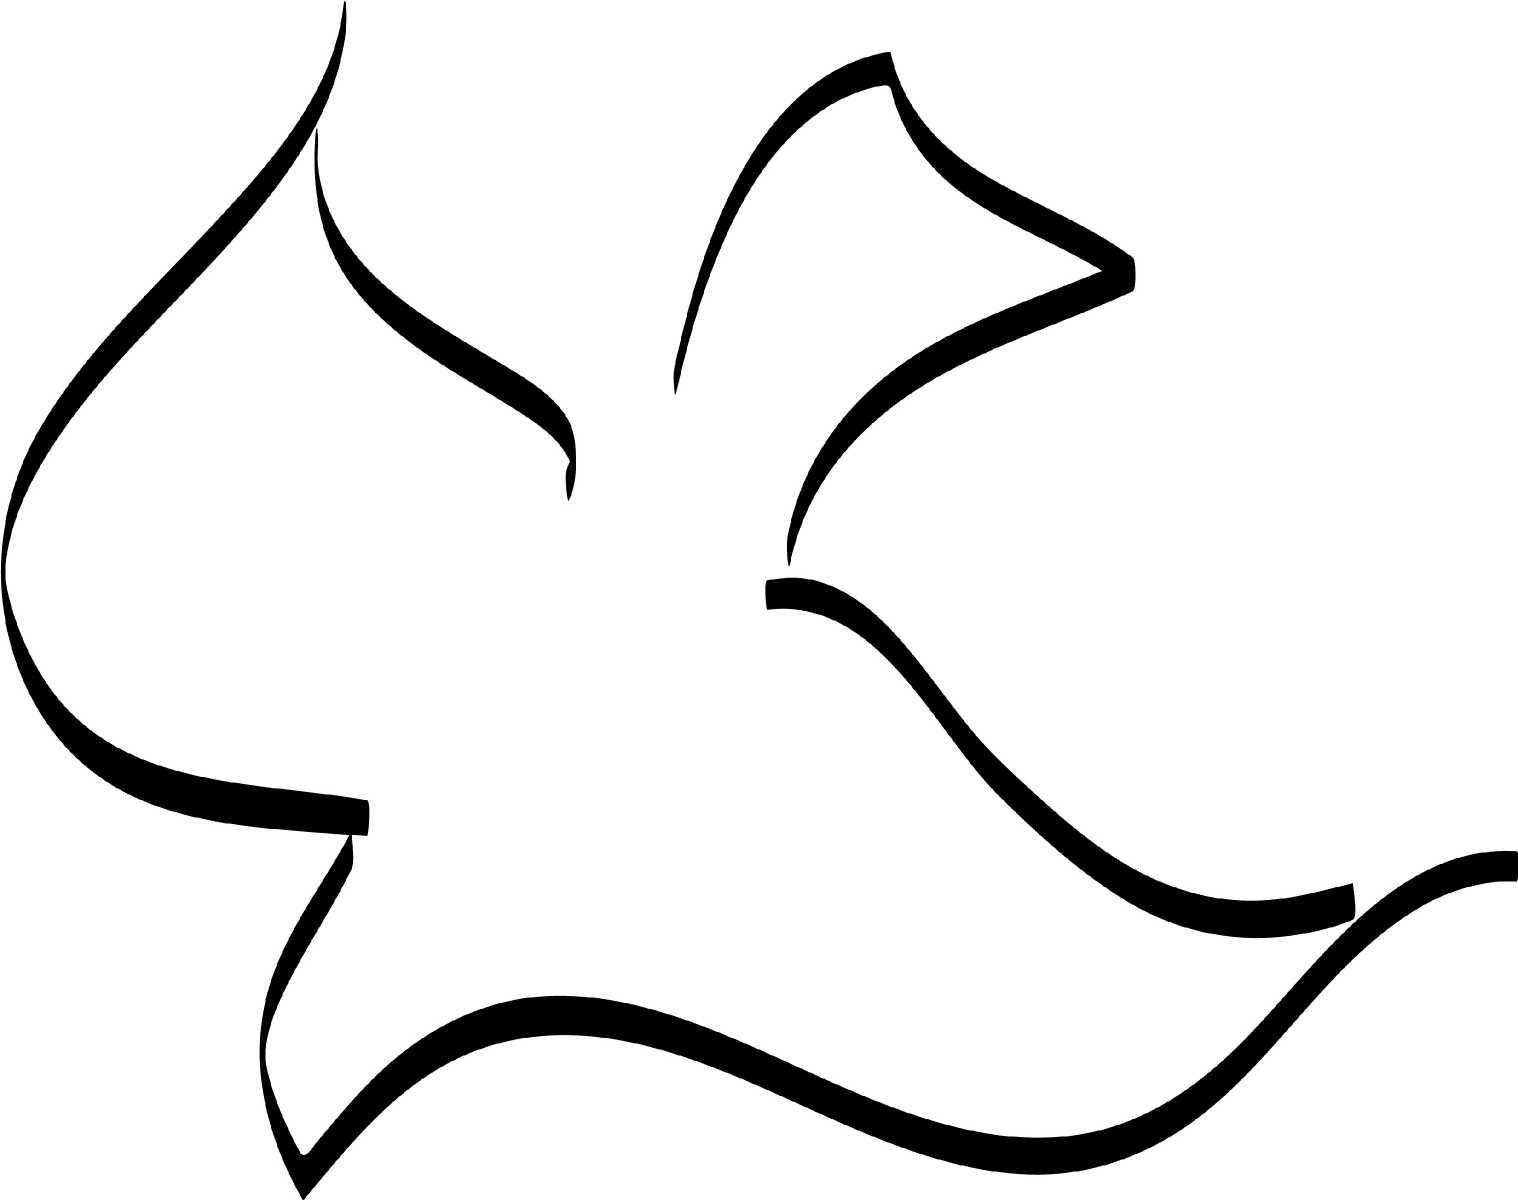 Free Holy Spirit Symbols, Download Free Clip Art, Free Clip.